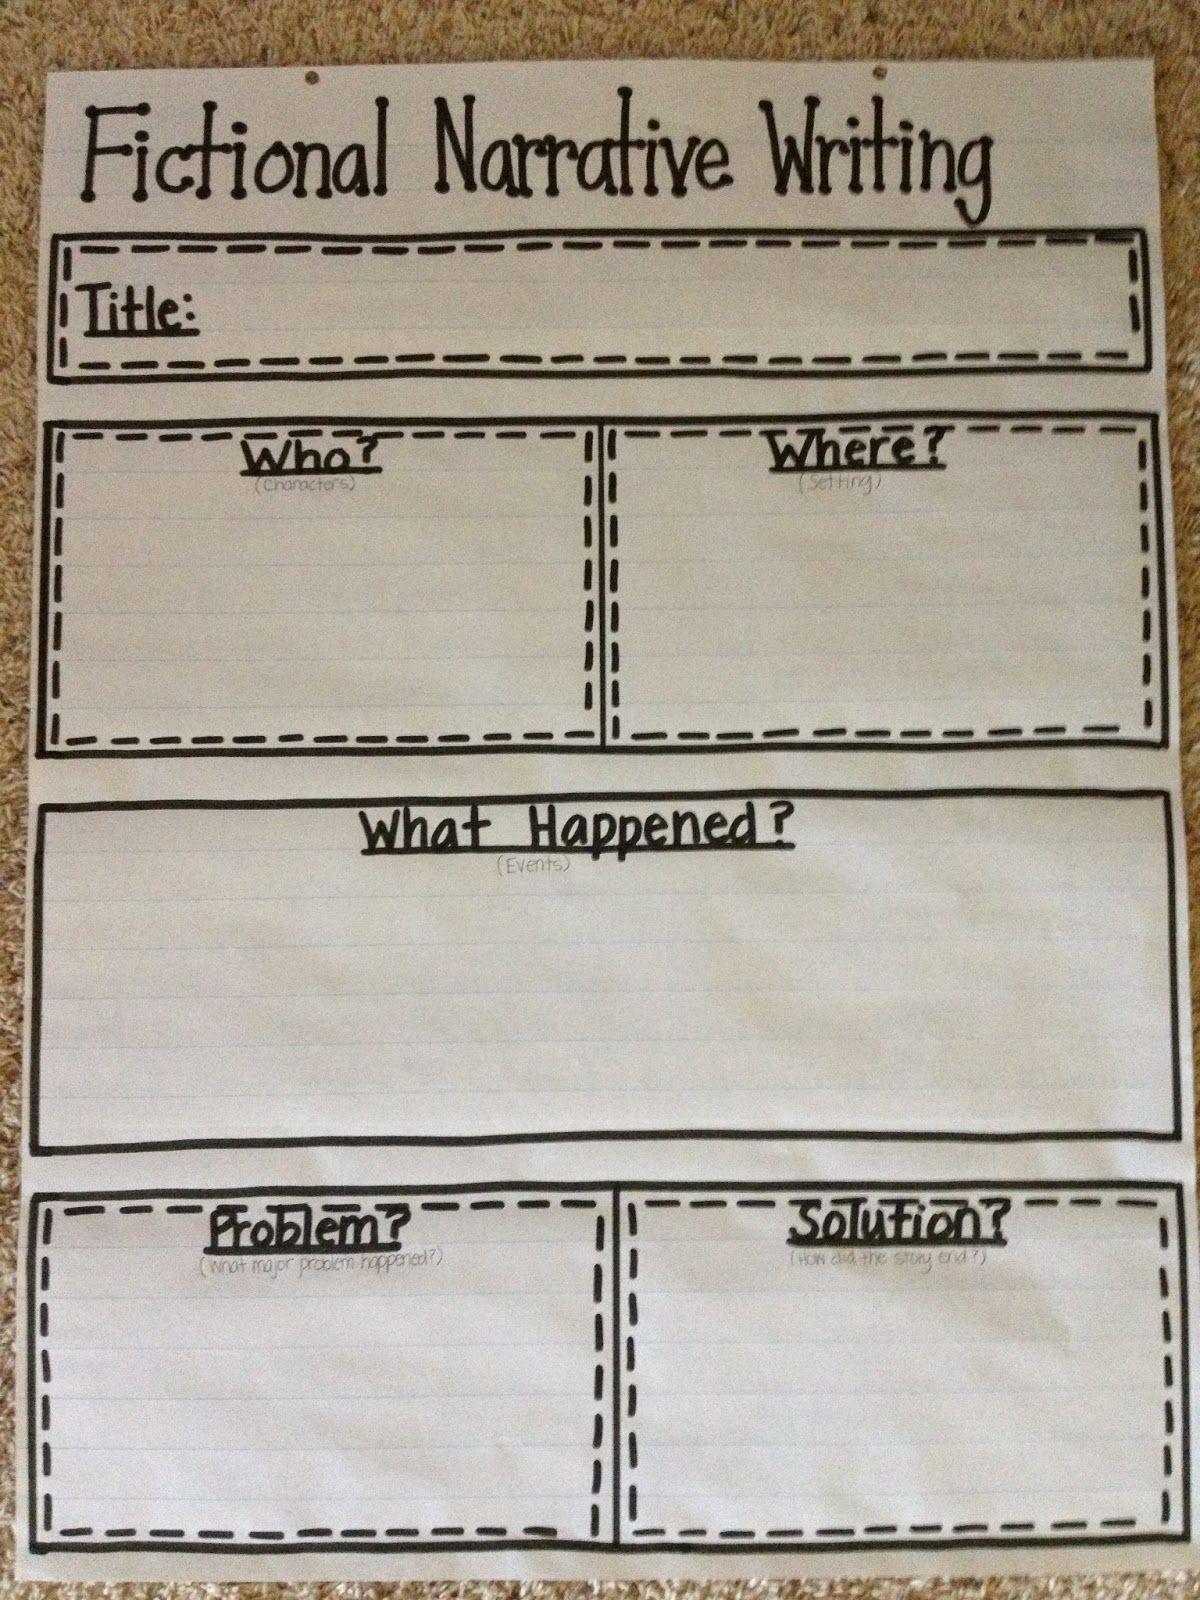 Fictional Narrative Writing Frame Mrs Terhune